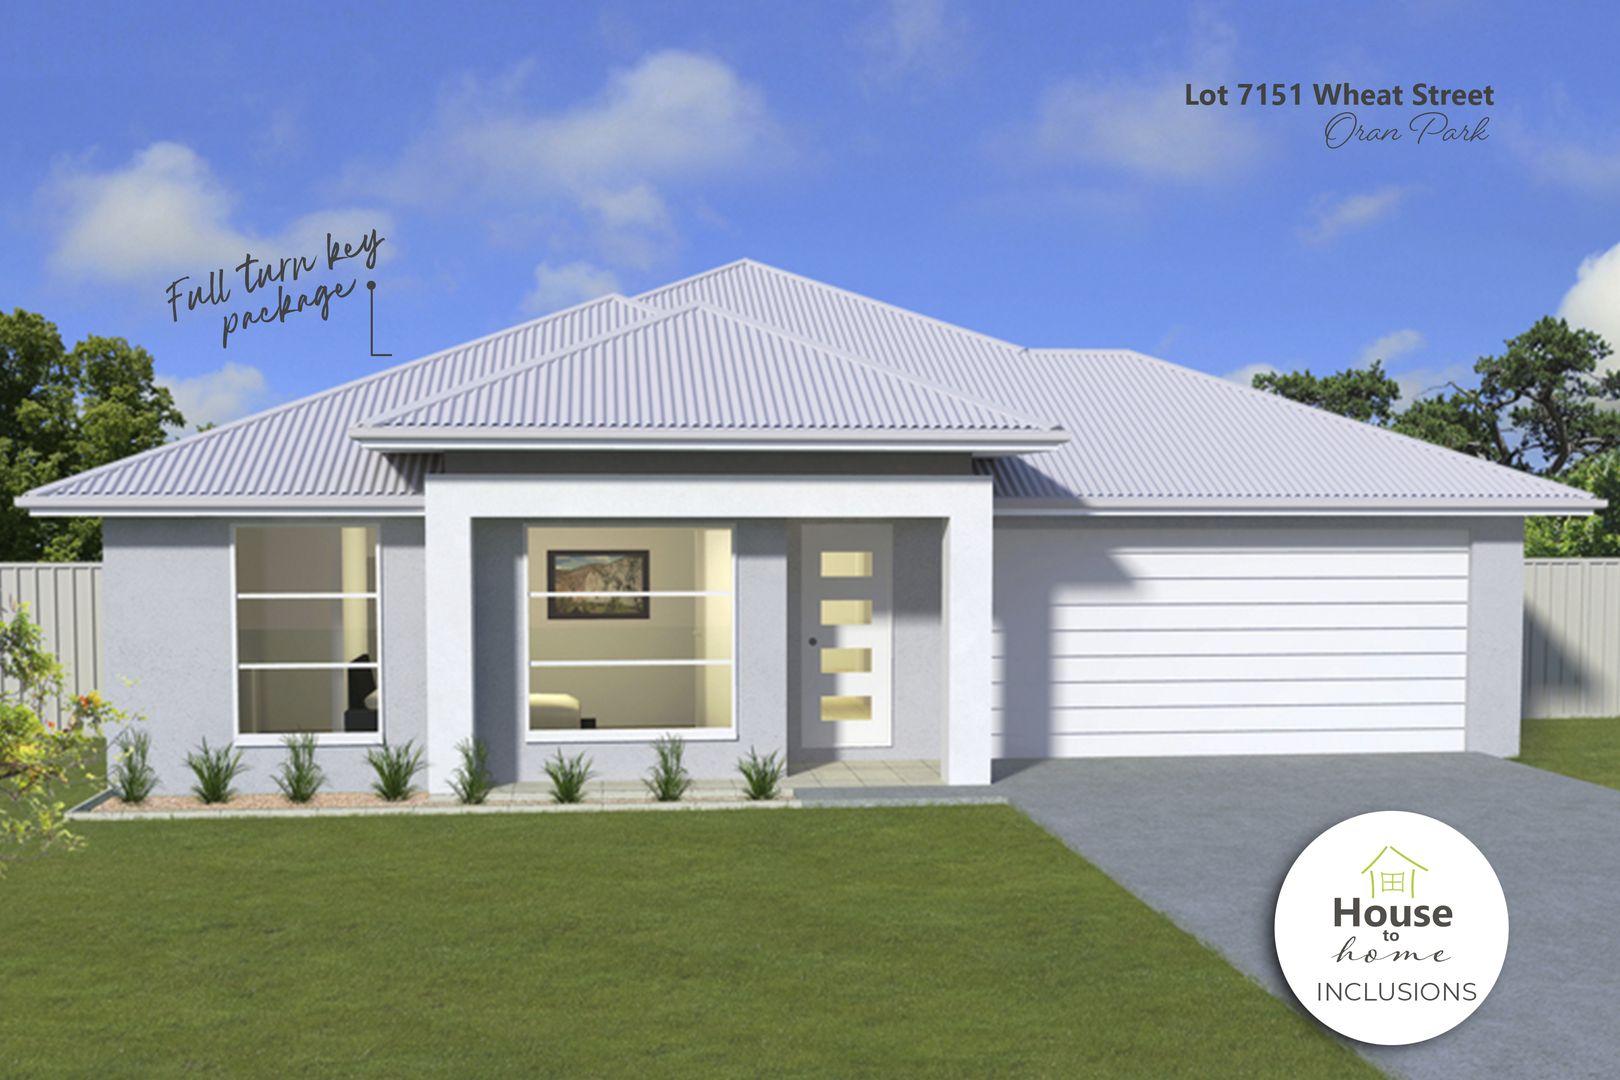 Lot 7151 Wheat Street, Oran Park NSW 2570, Image 0